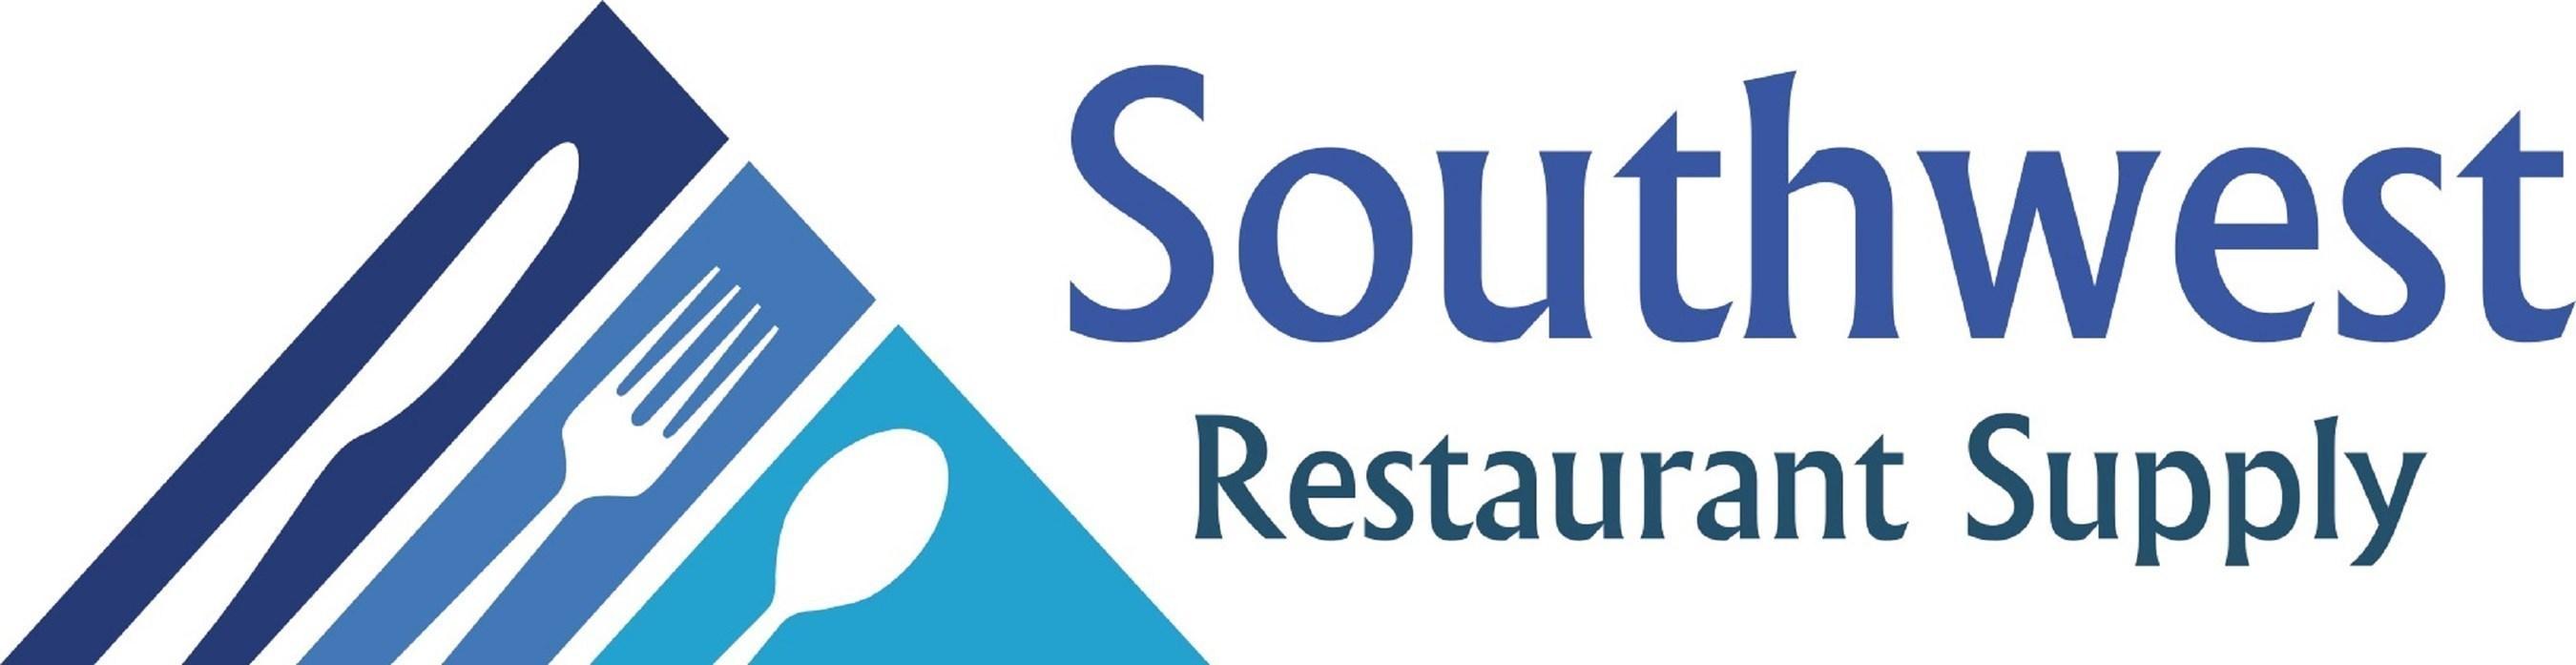 Southwest Restaurant Supply Receives 2016 Phoenix Award For